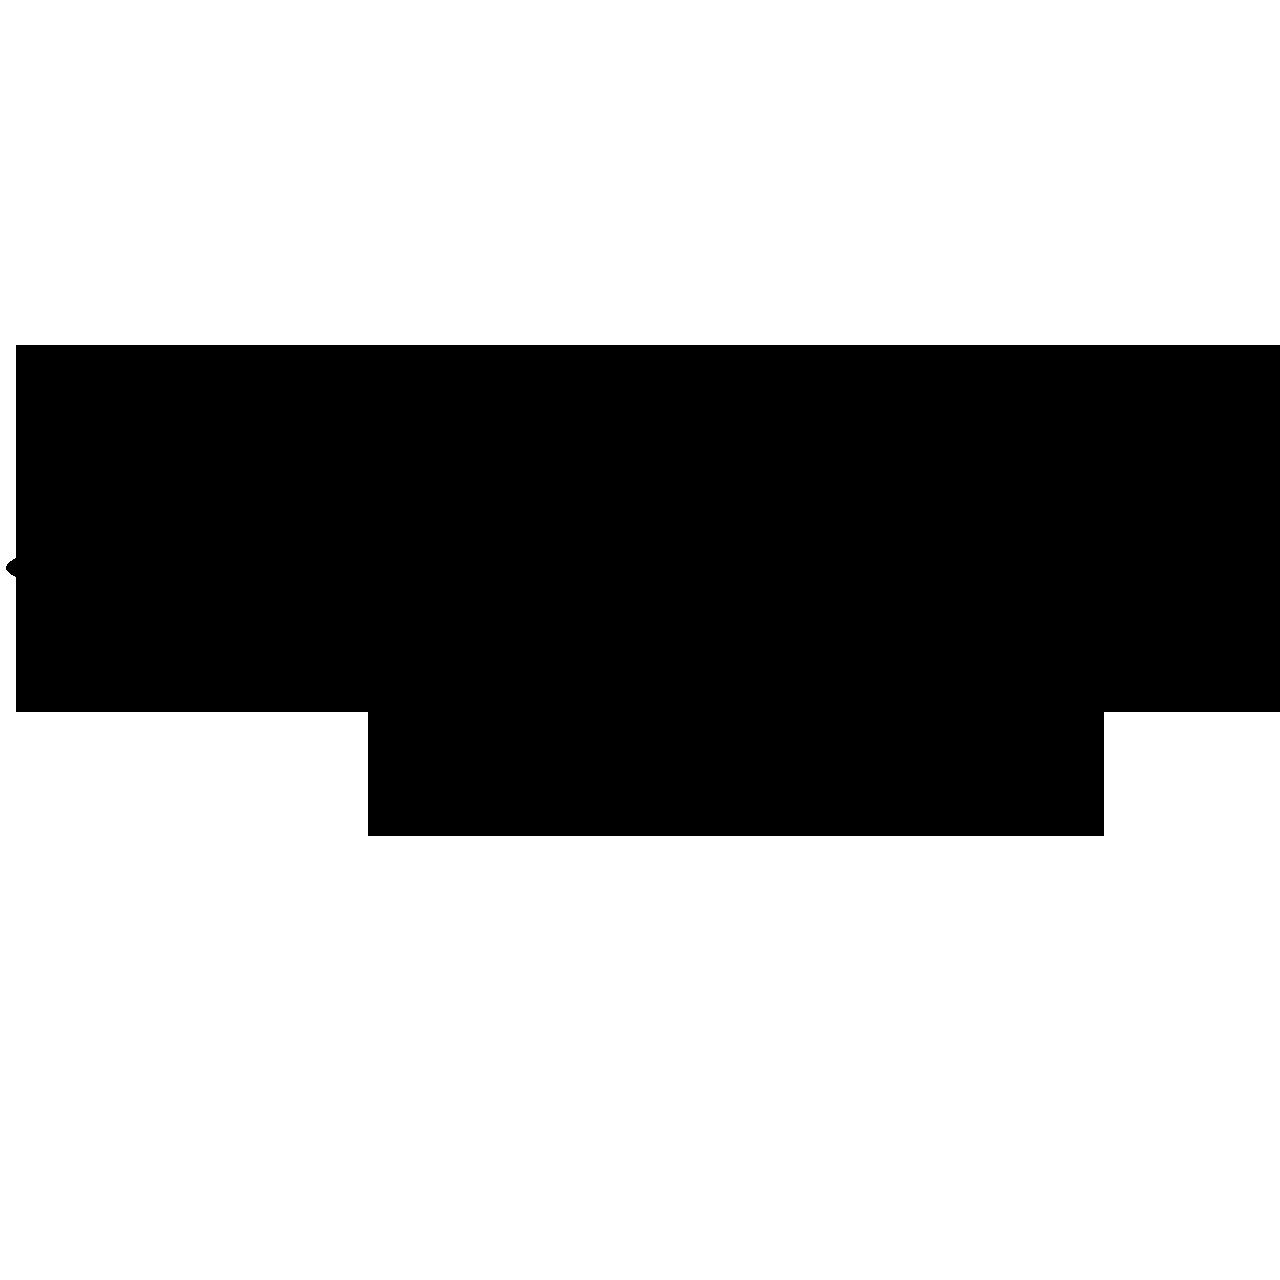 hc [black].png